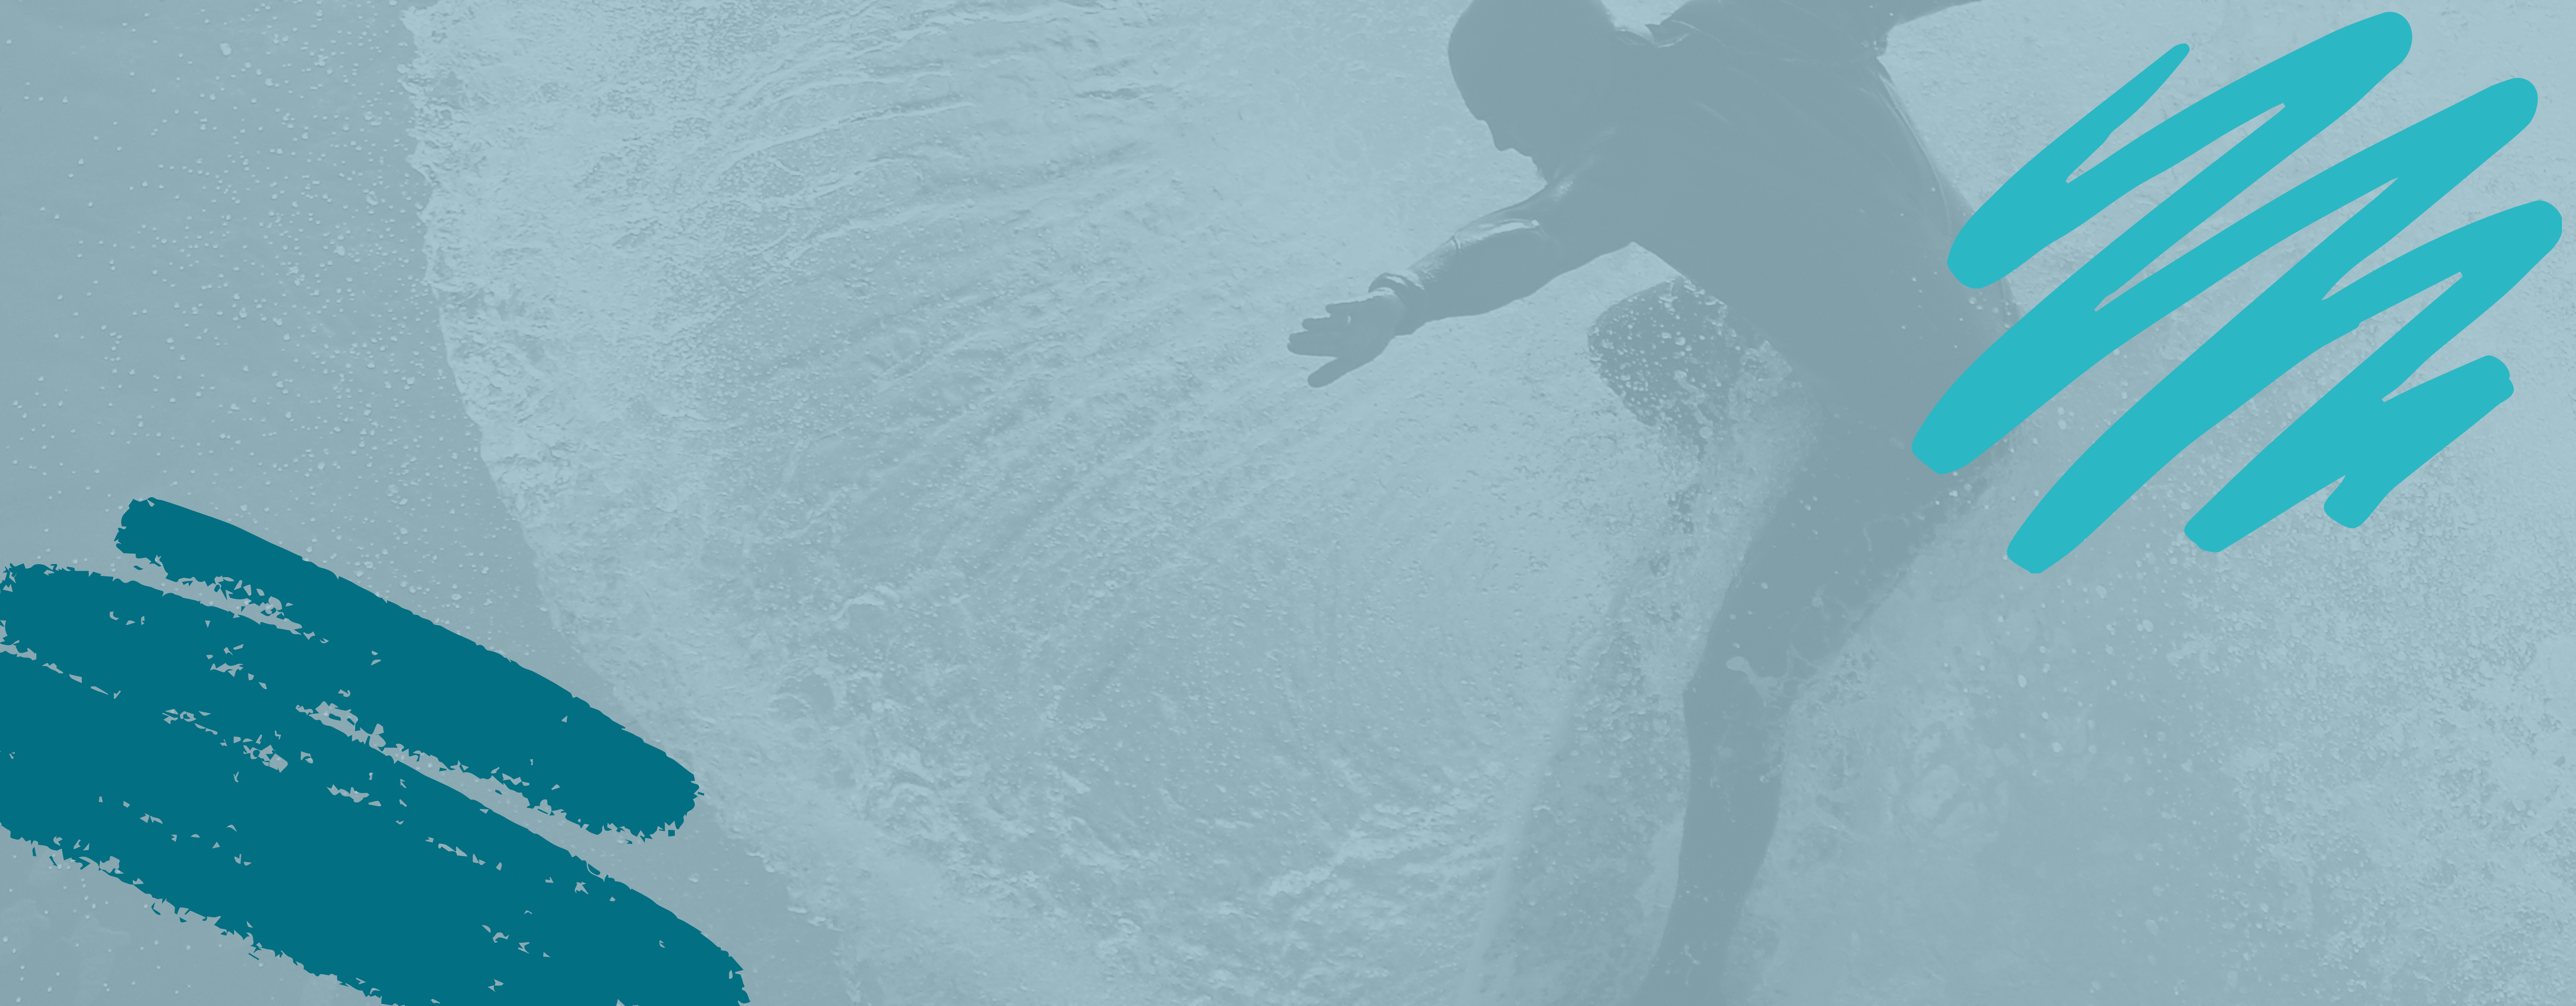 TeQflo Master Surfer 2